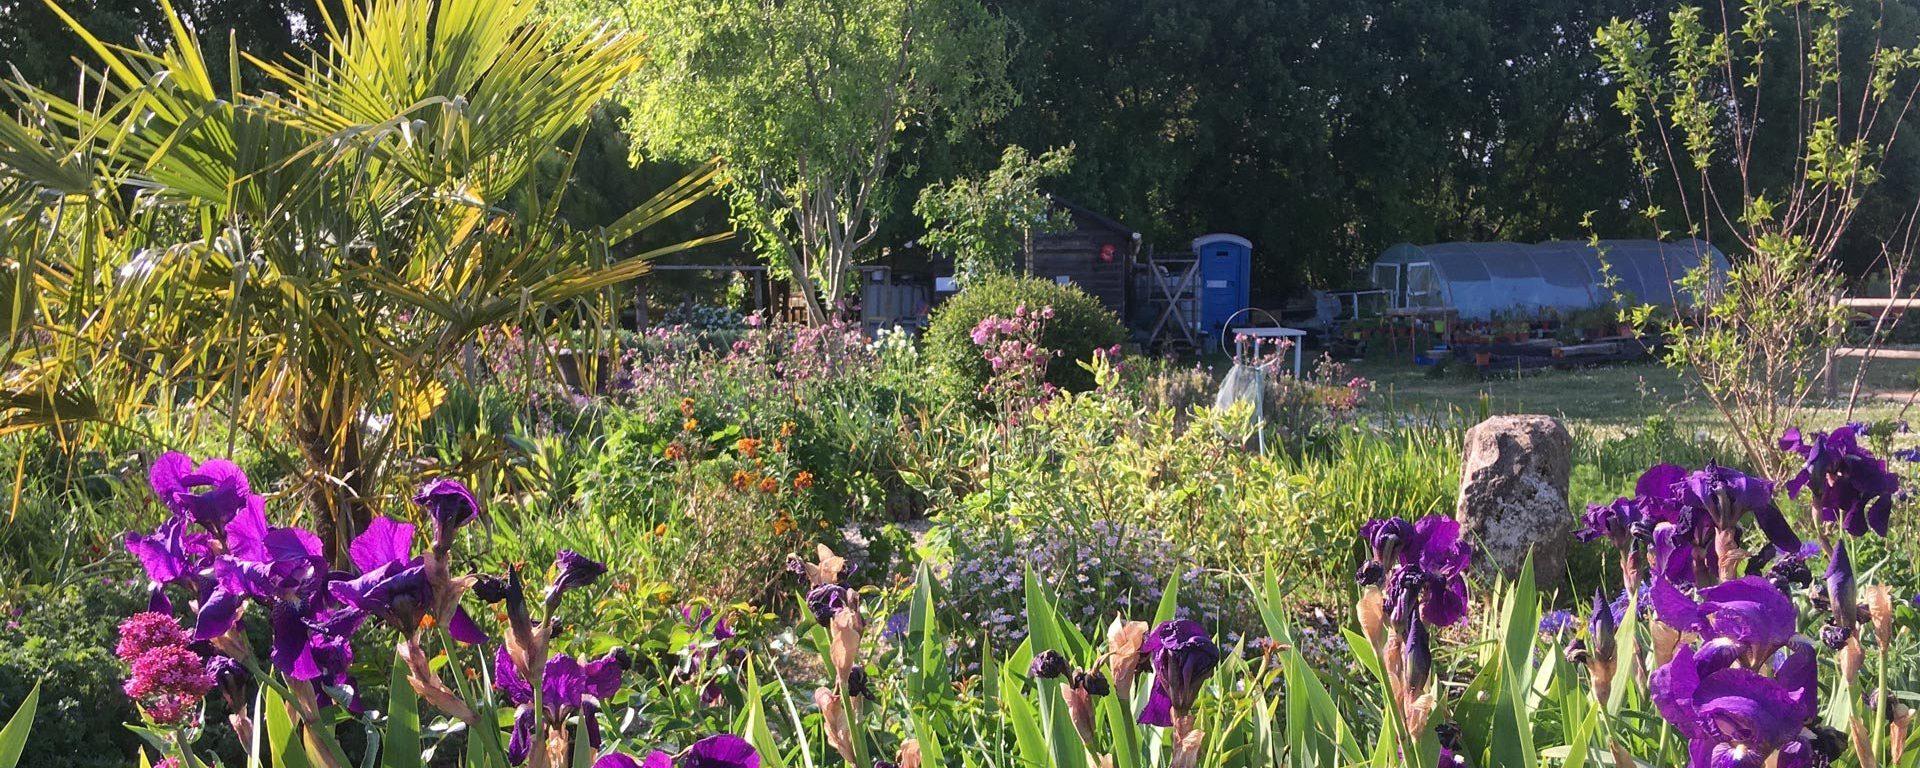 jardin-en-folie-andillyotamp-c-aspect-ratio-2000-800